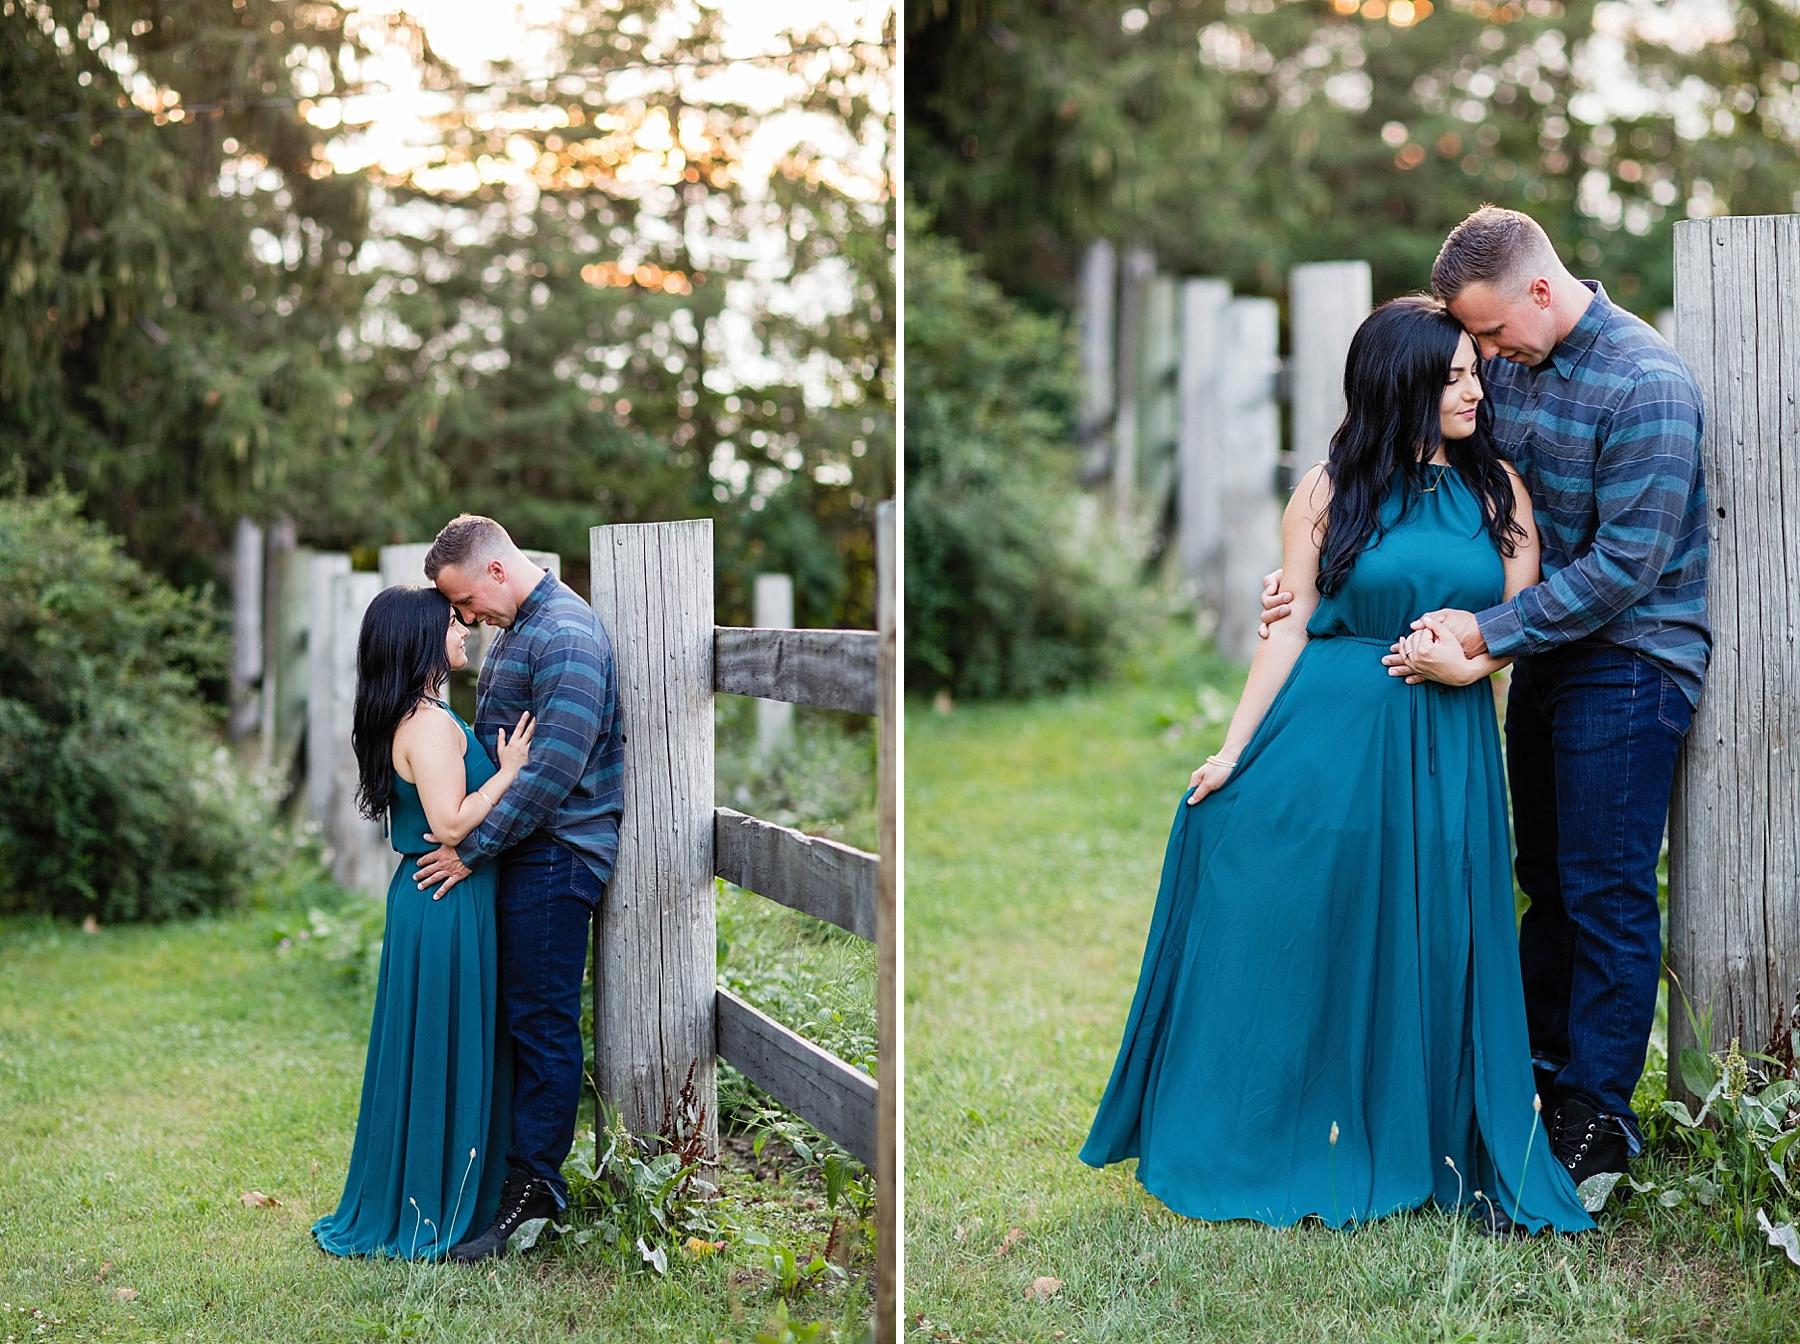 windsor-wedding-engagement-photographer-eryn-shea-photography-field-of-flowers_0018.jpg